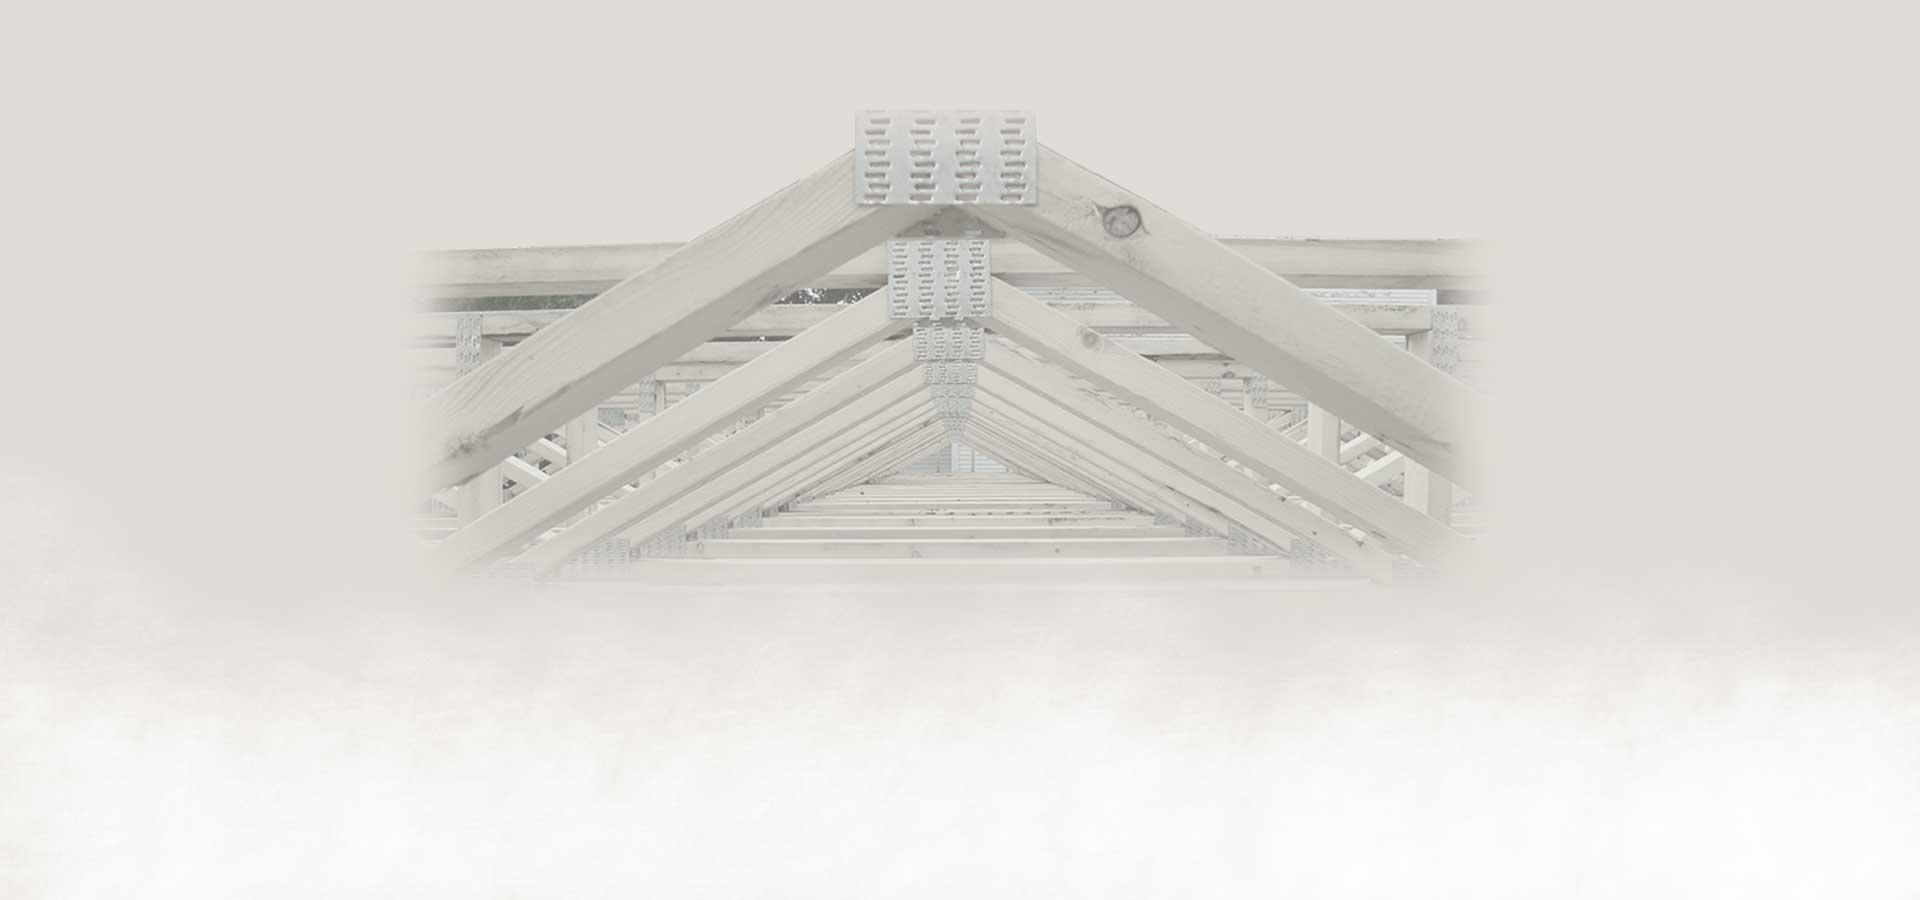 Header Roof Truss Image